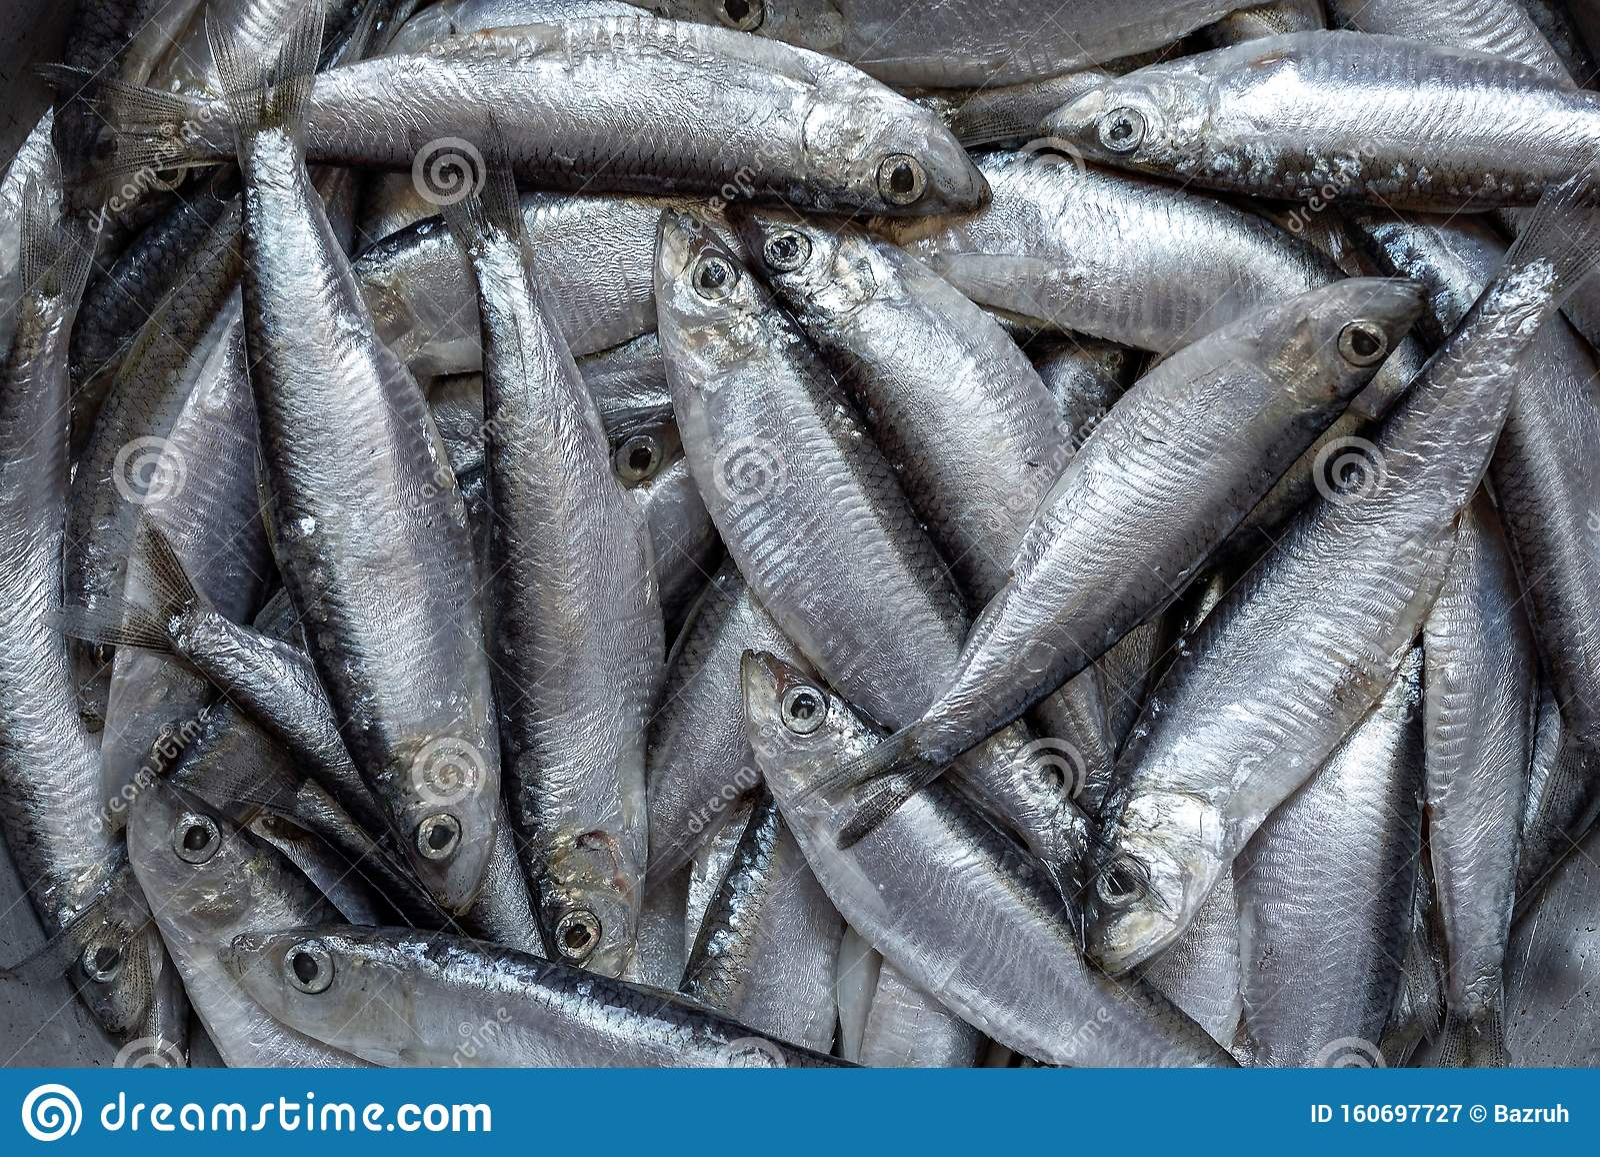 Freshly caught sprat fish stock image. Image of gourmet - 160697727